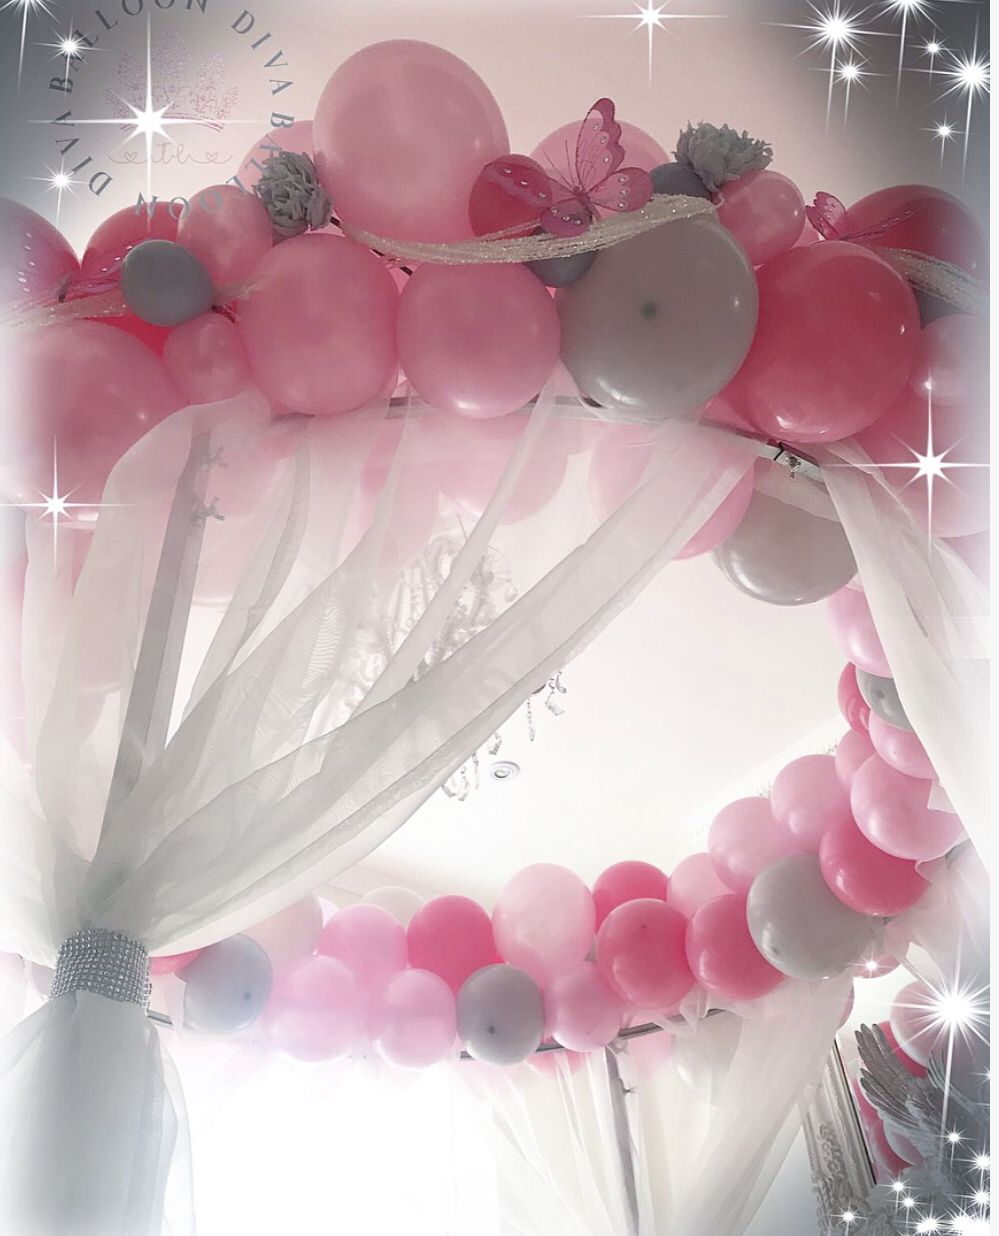 Cake Table Decoration Diy Wedding Lighting Balloons Cake Table Decorations